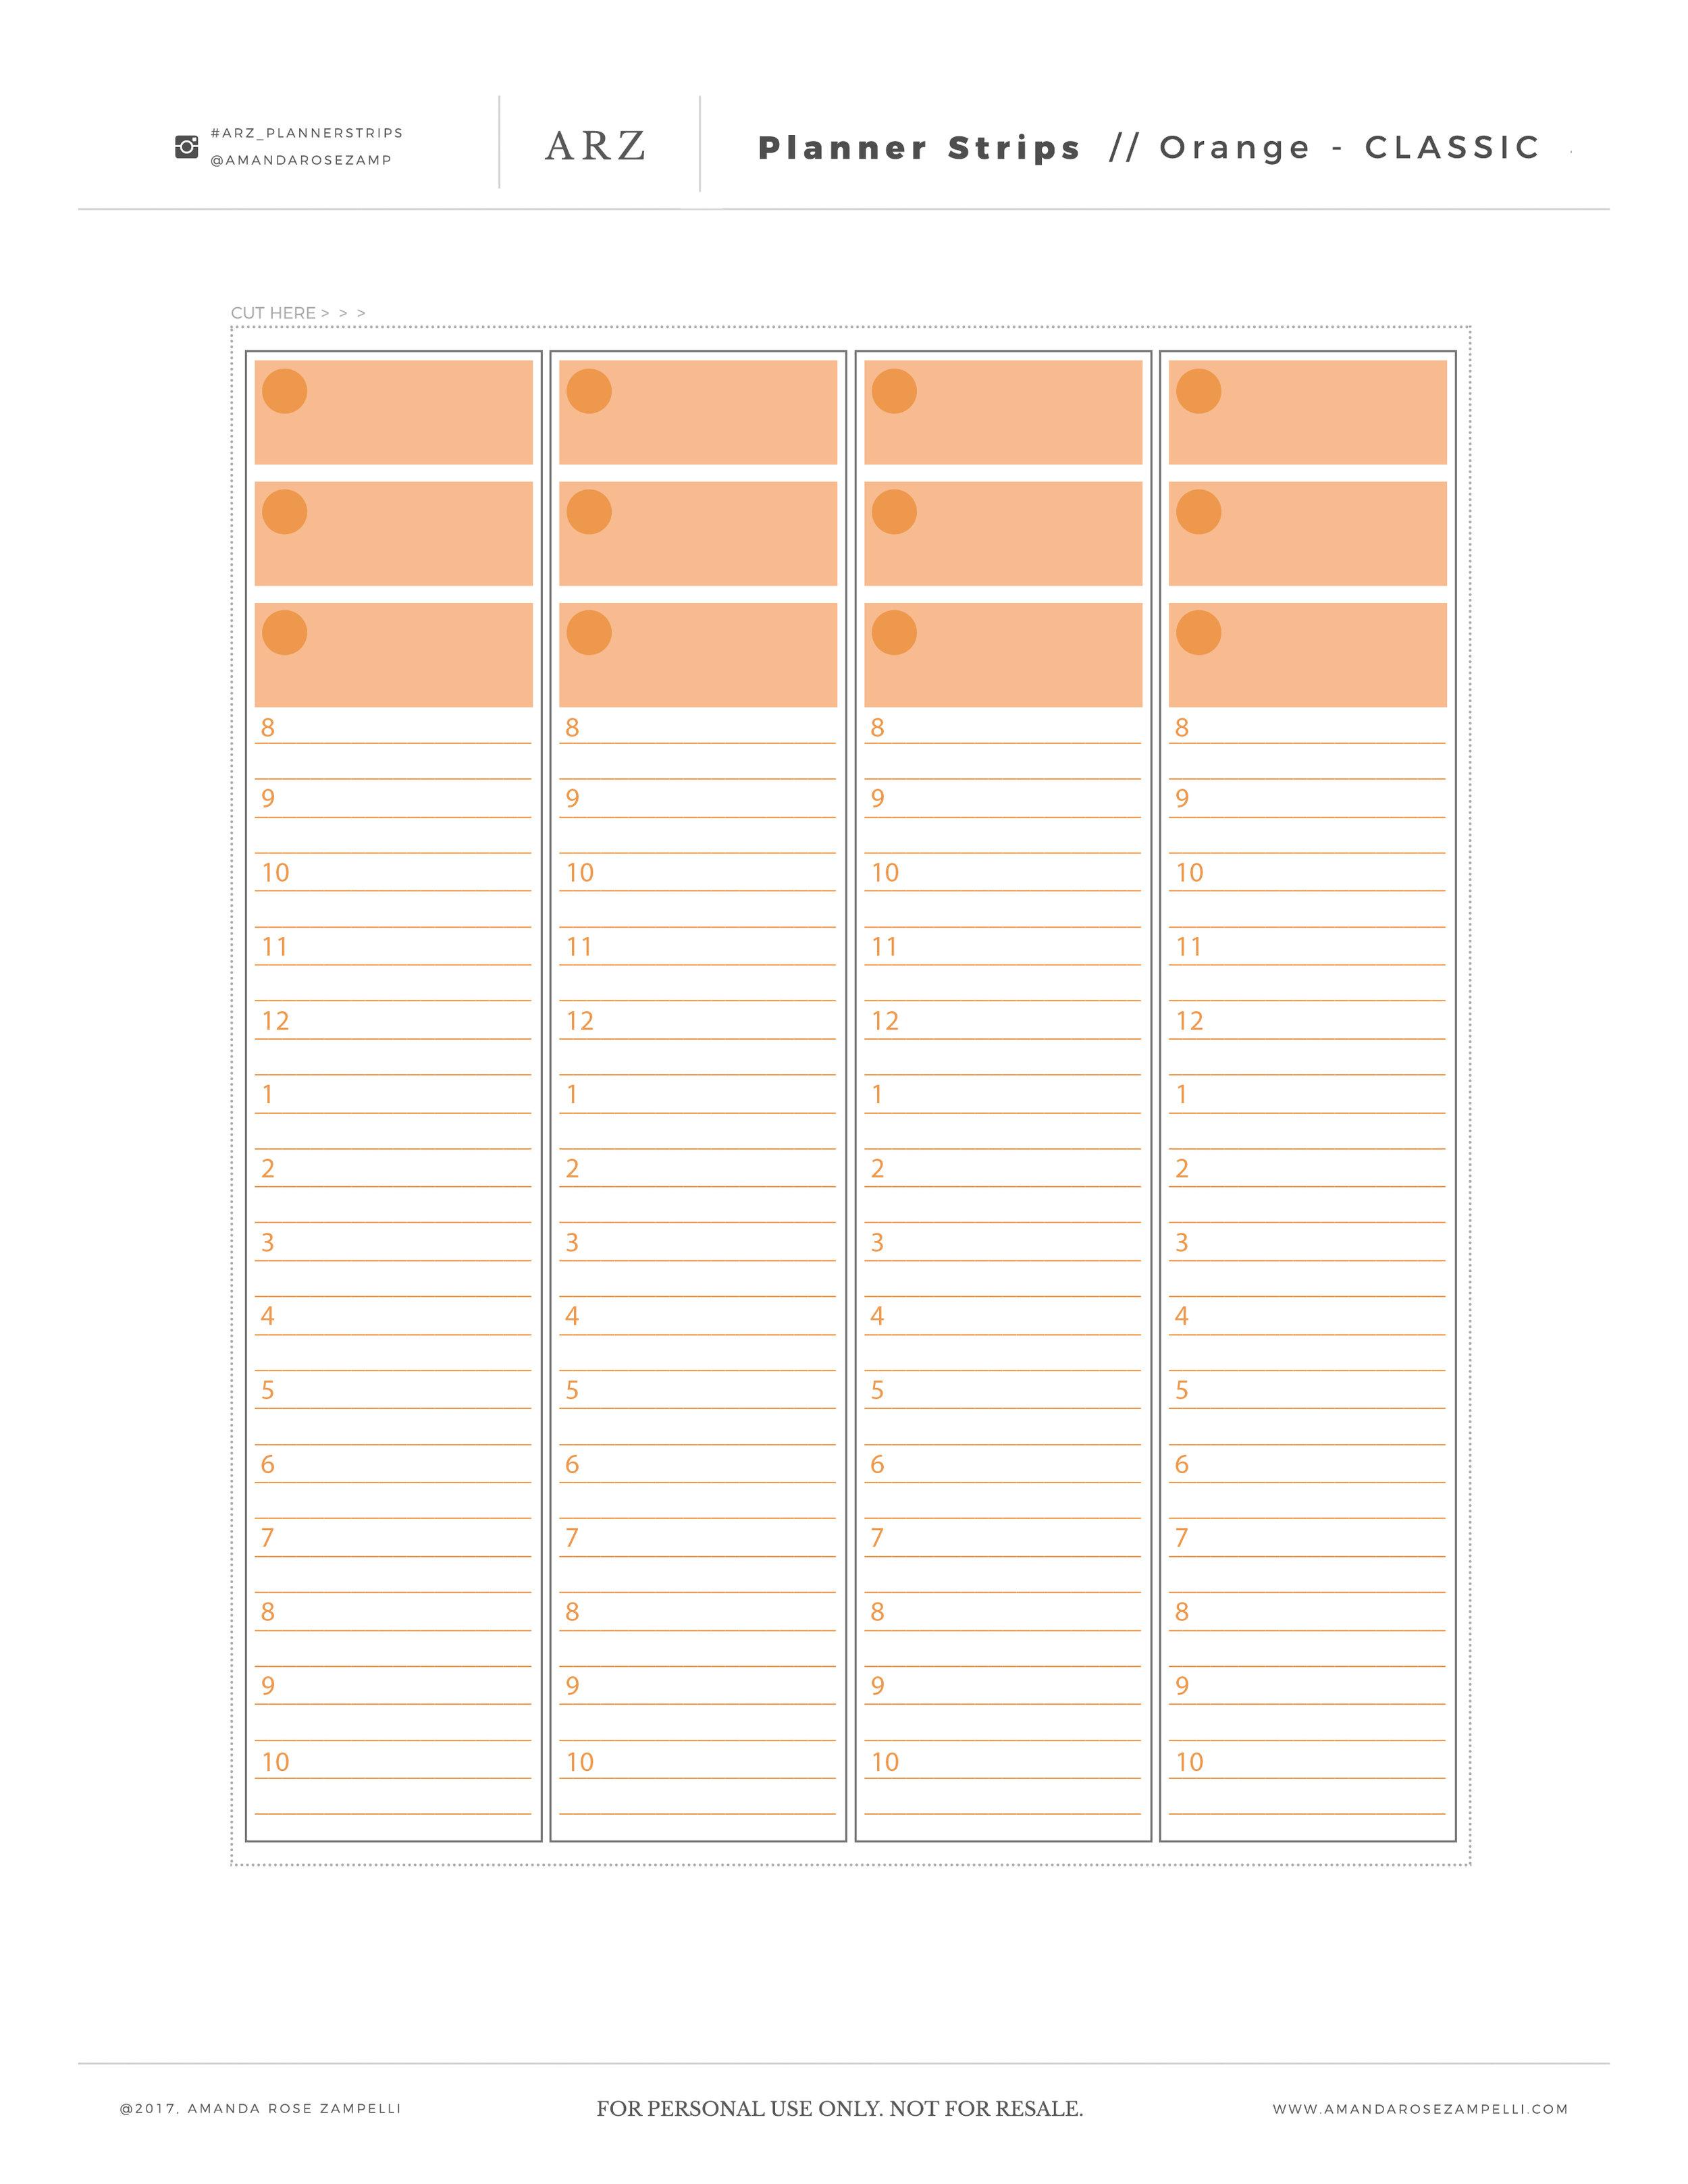 02 CLASSIC orange TH - SN planner strips.jpg